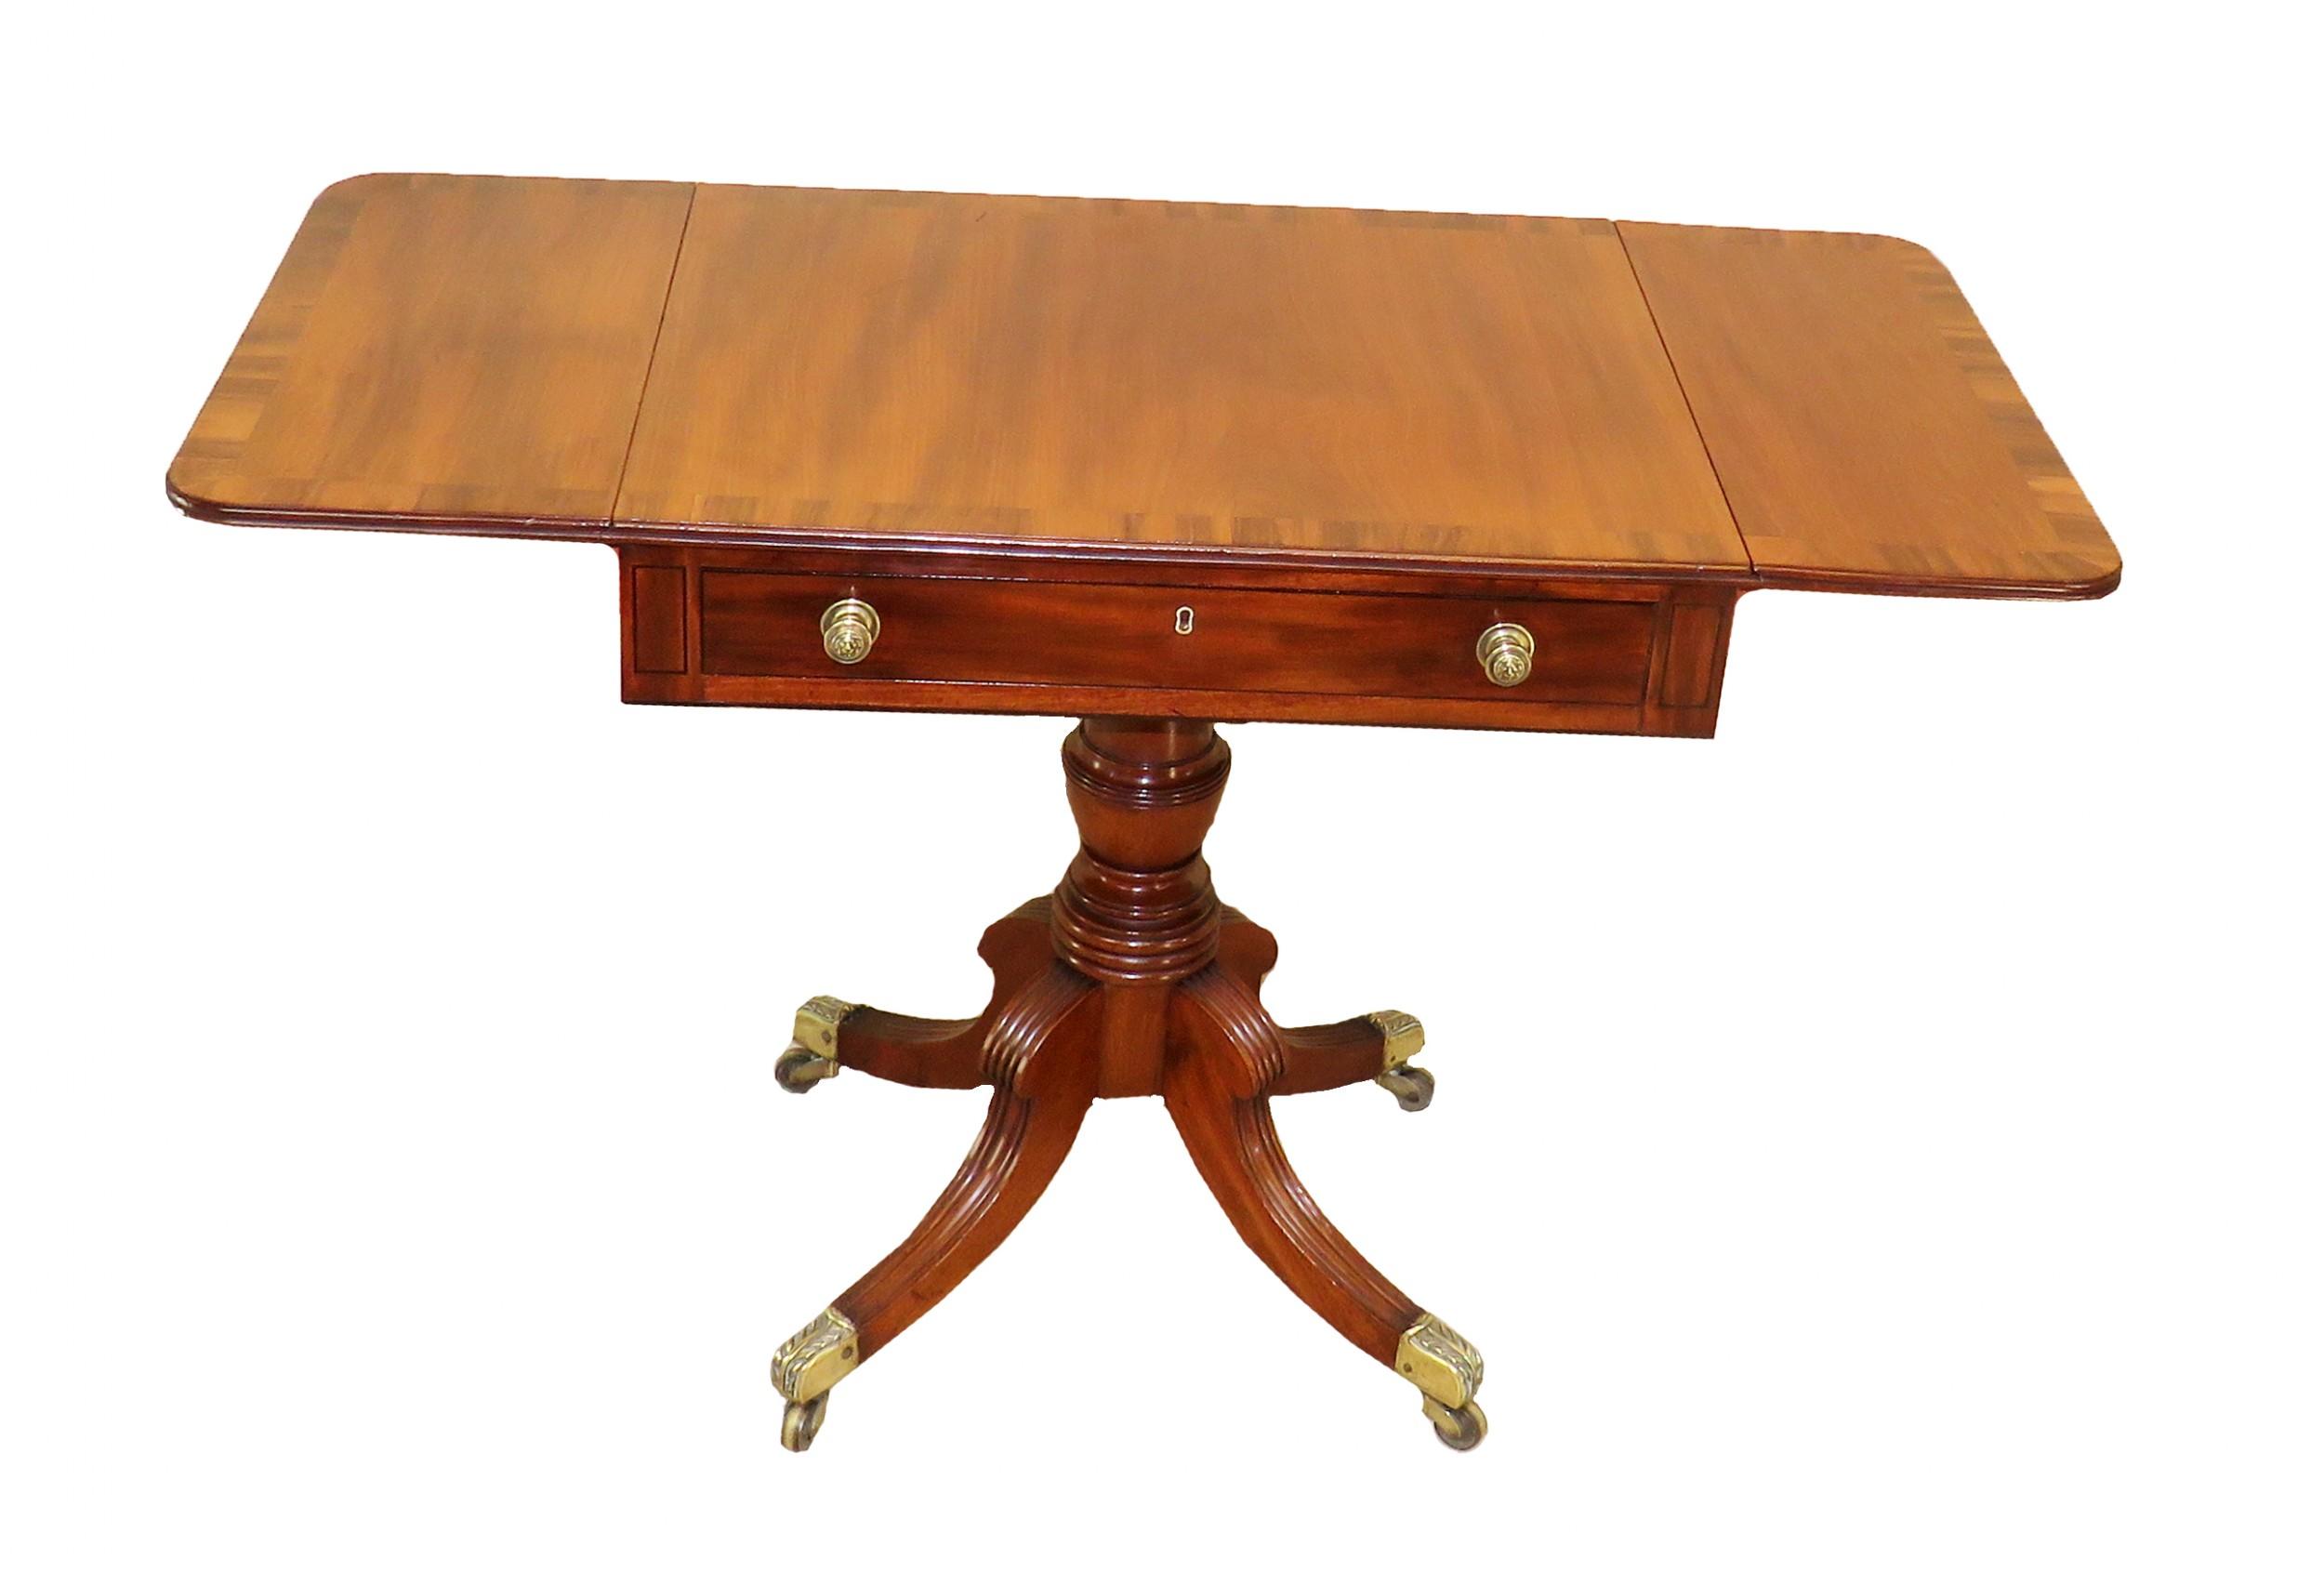 regency mahogany english antique 19th century pembroke table